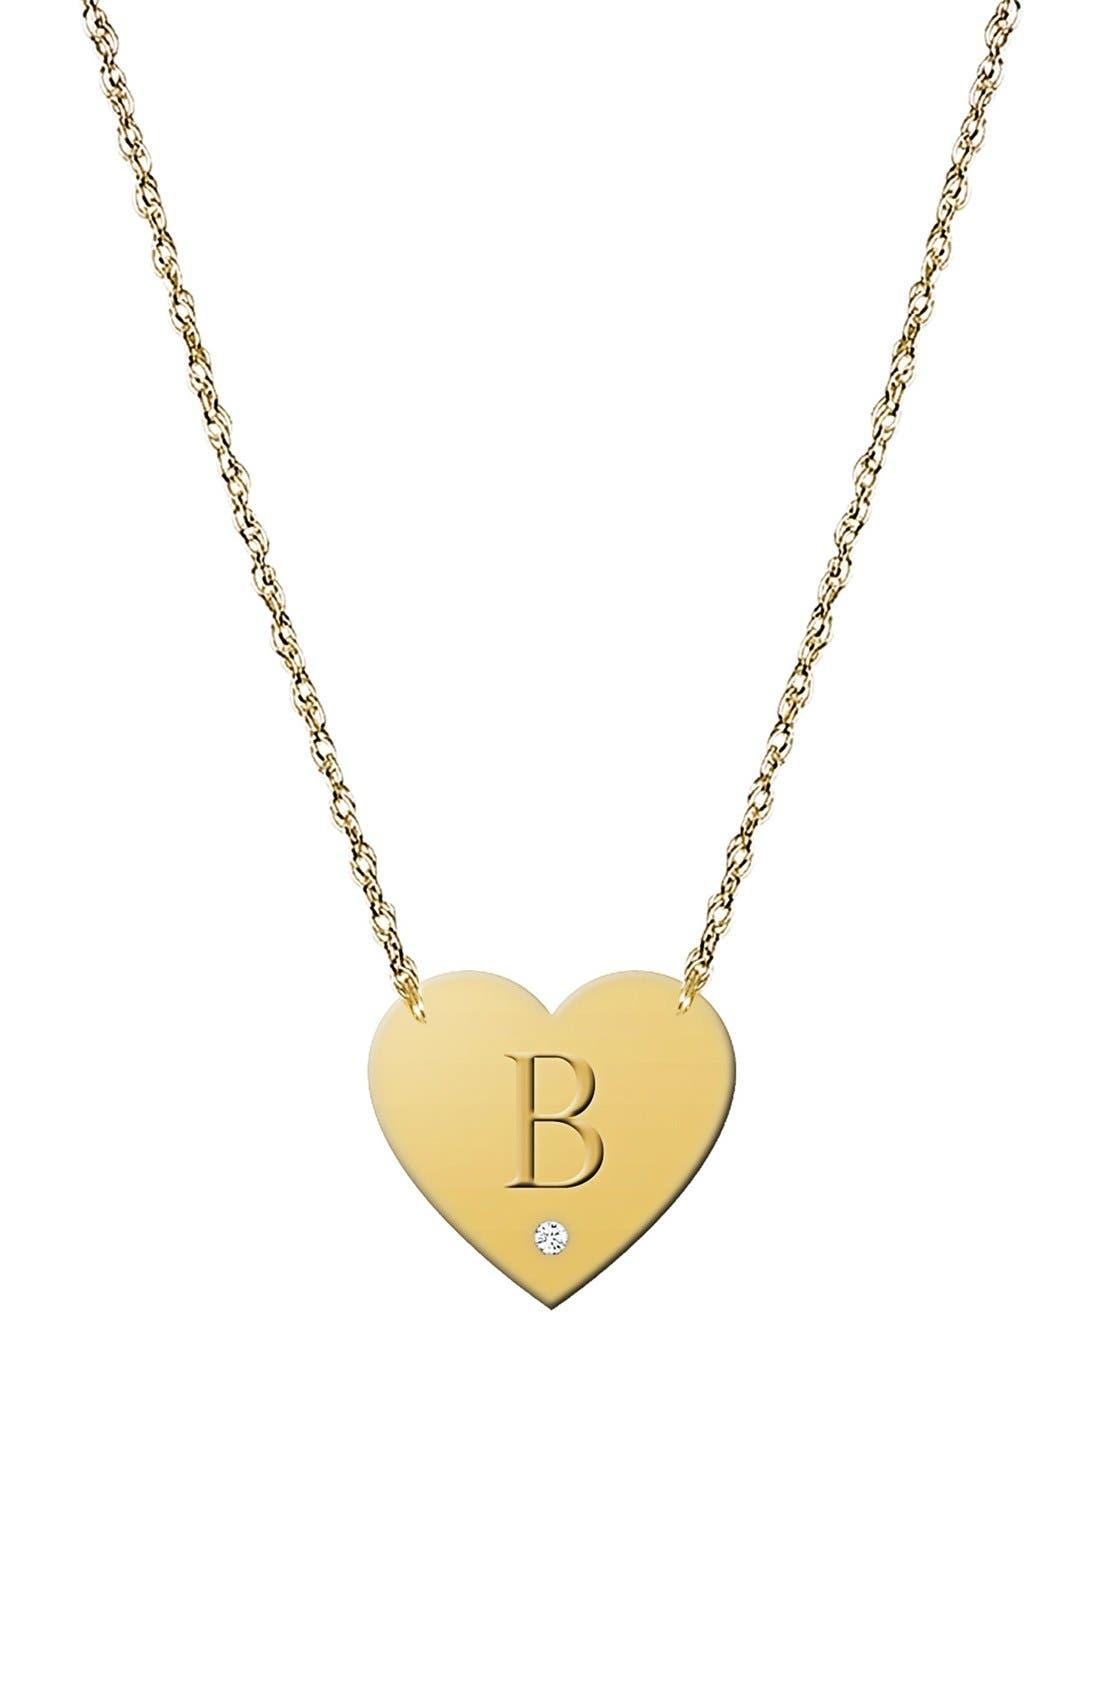 Diamond & Initial Pendant Necklace,                             Main thumbnail 1, color,                             GOLD - B